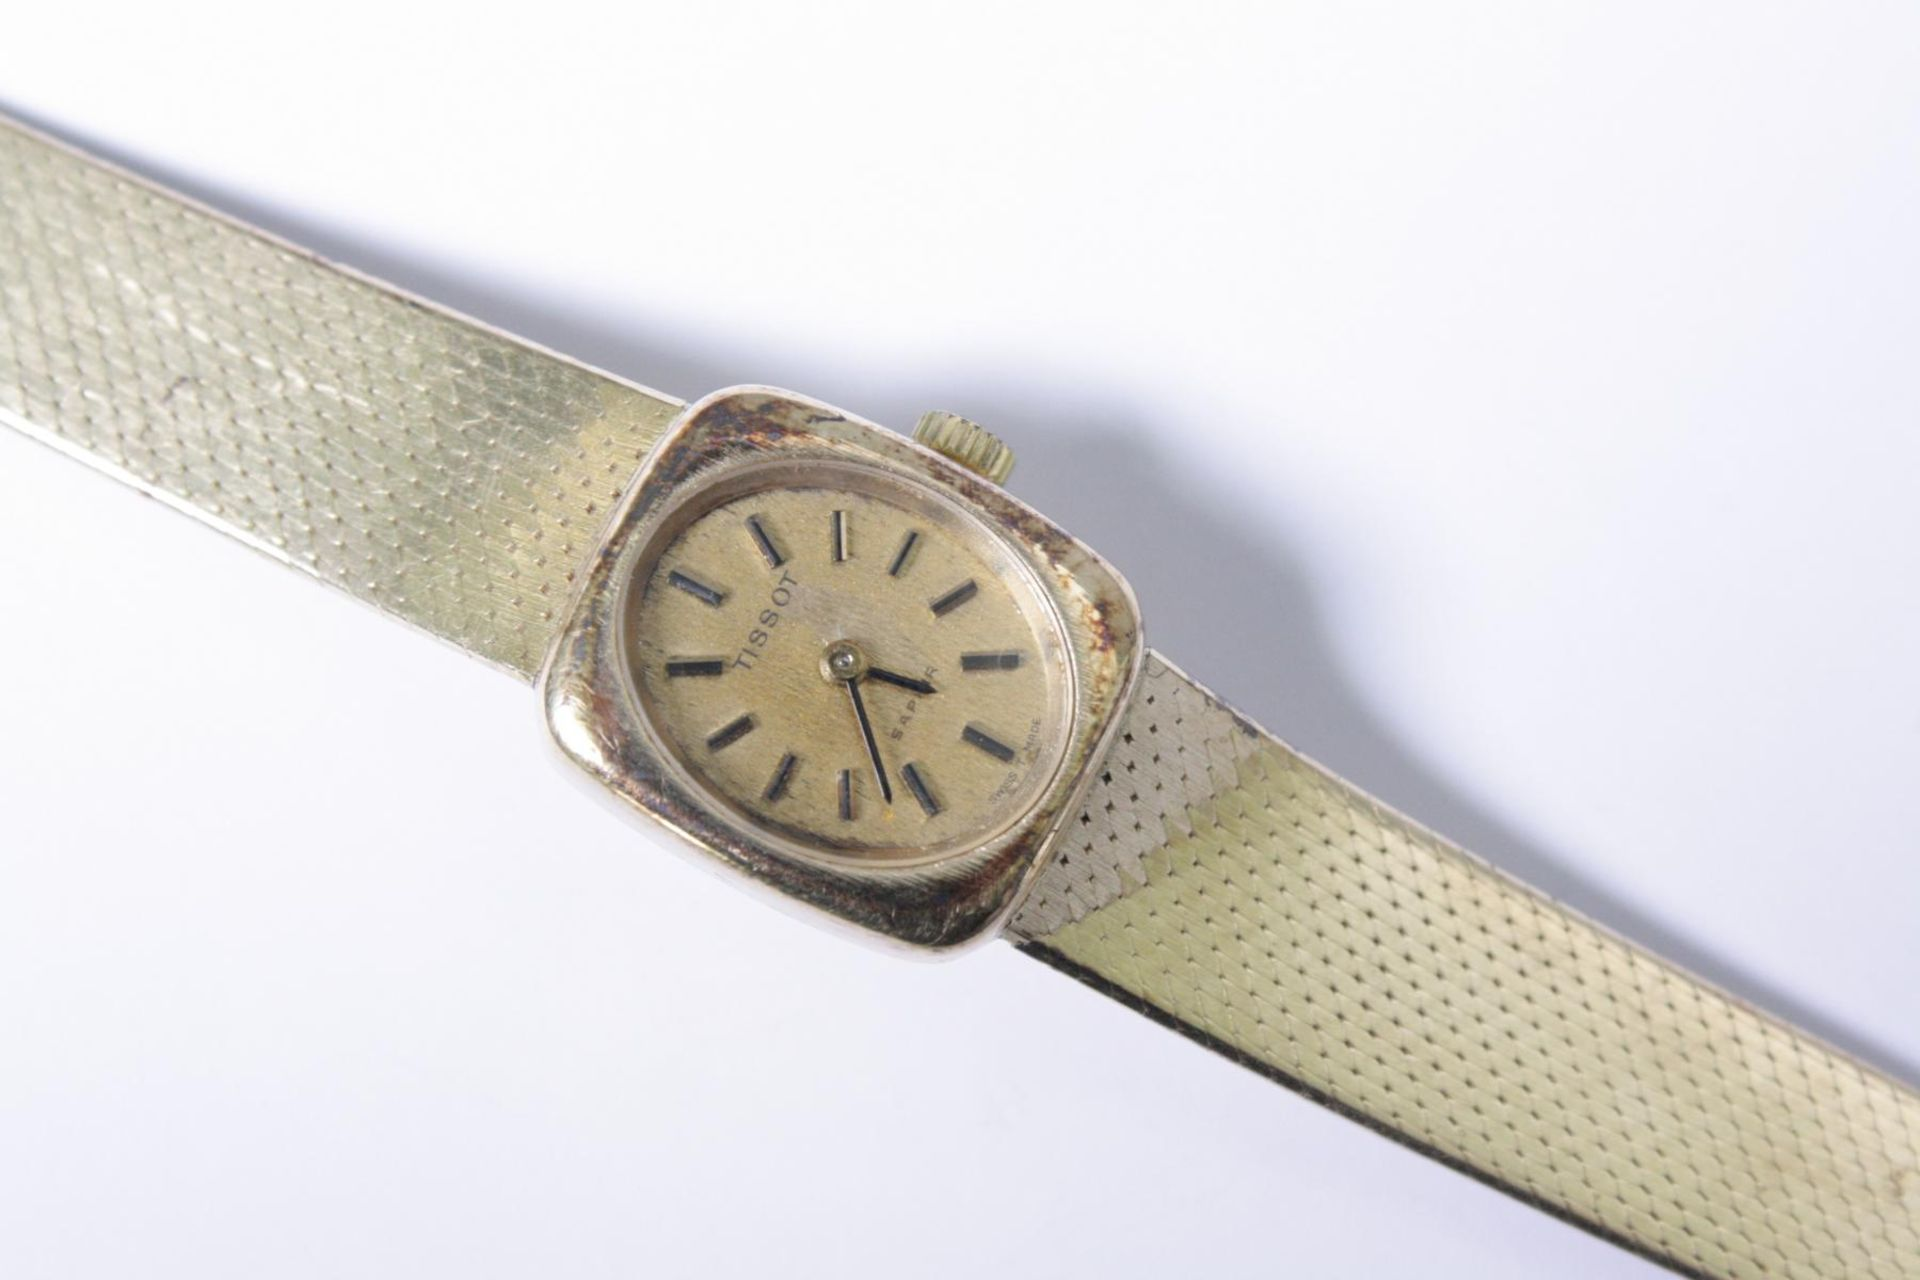 Tissot Damenarmbanduhr, 14 Karat Gelbgold - Bild 2 aus 3